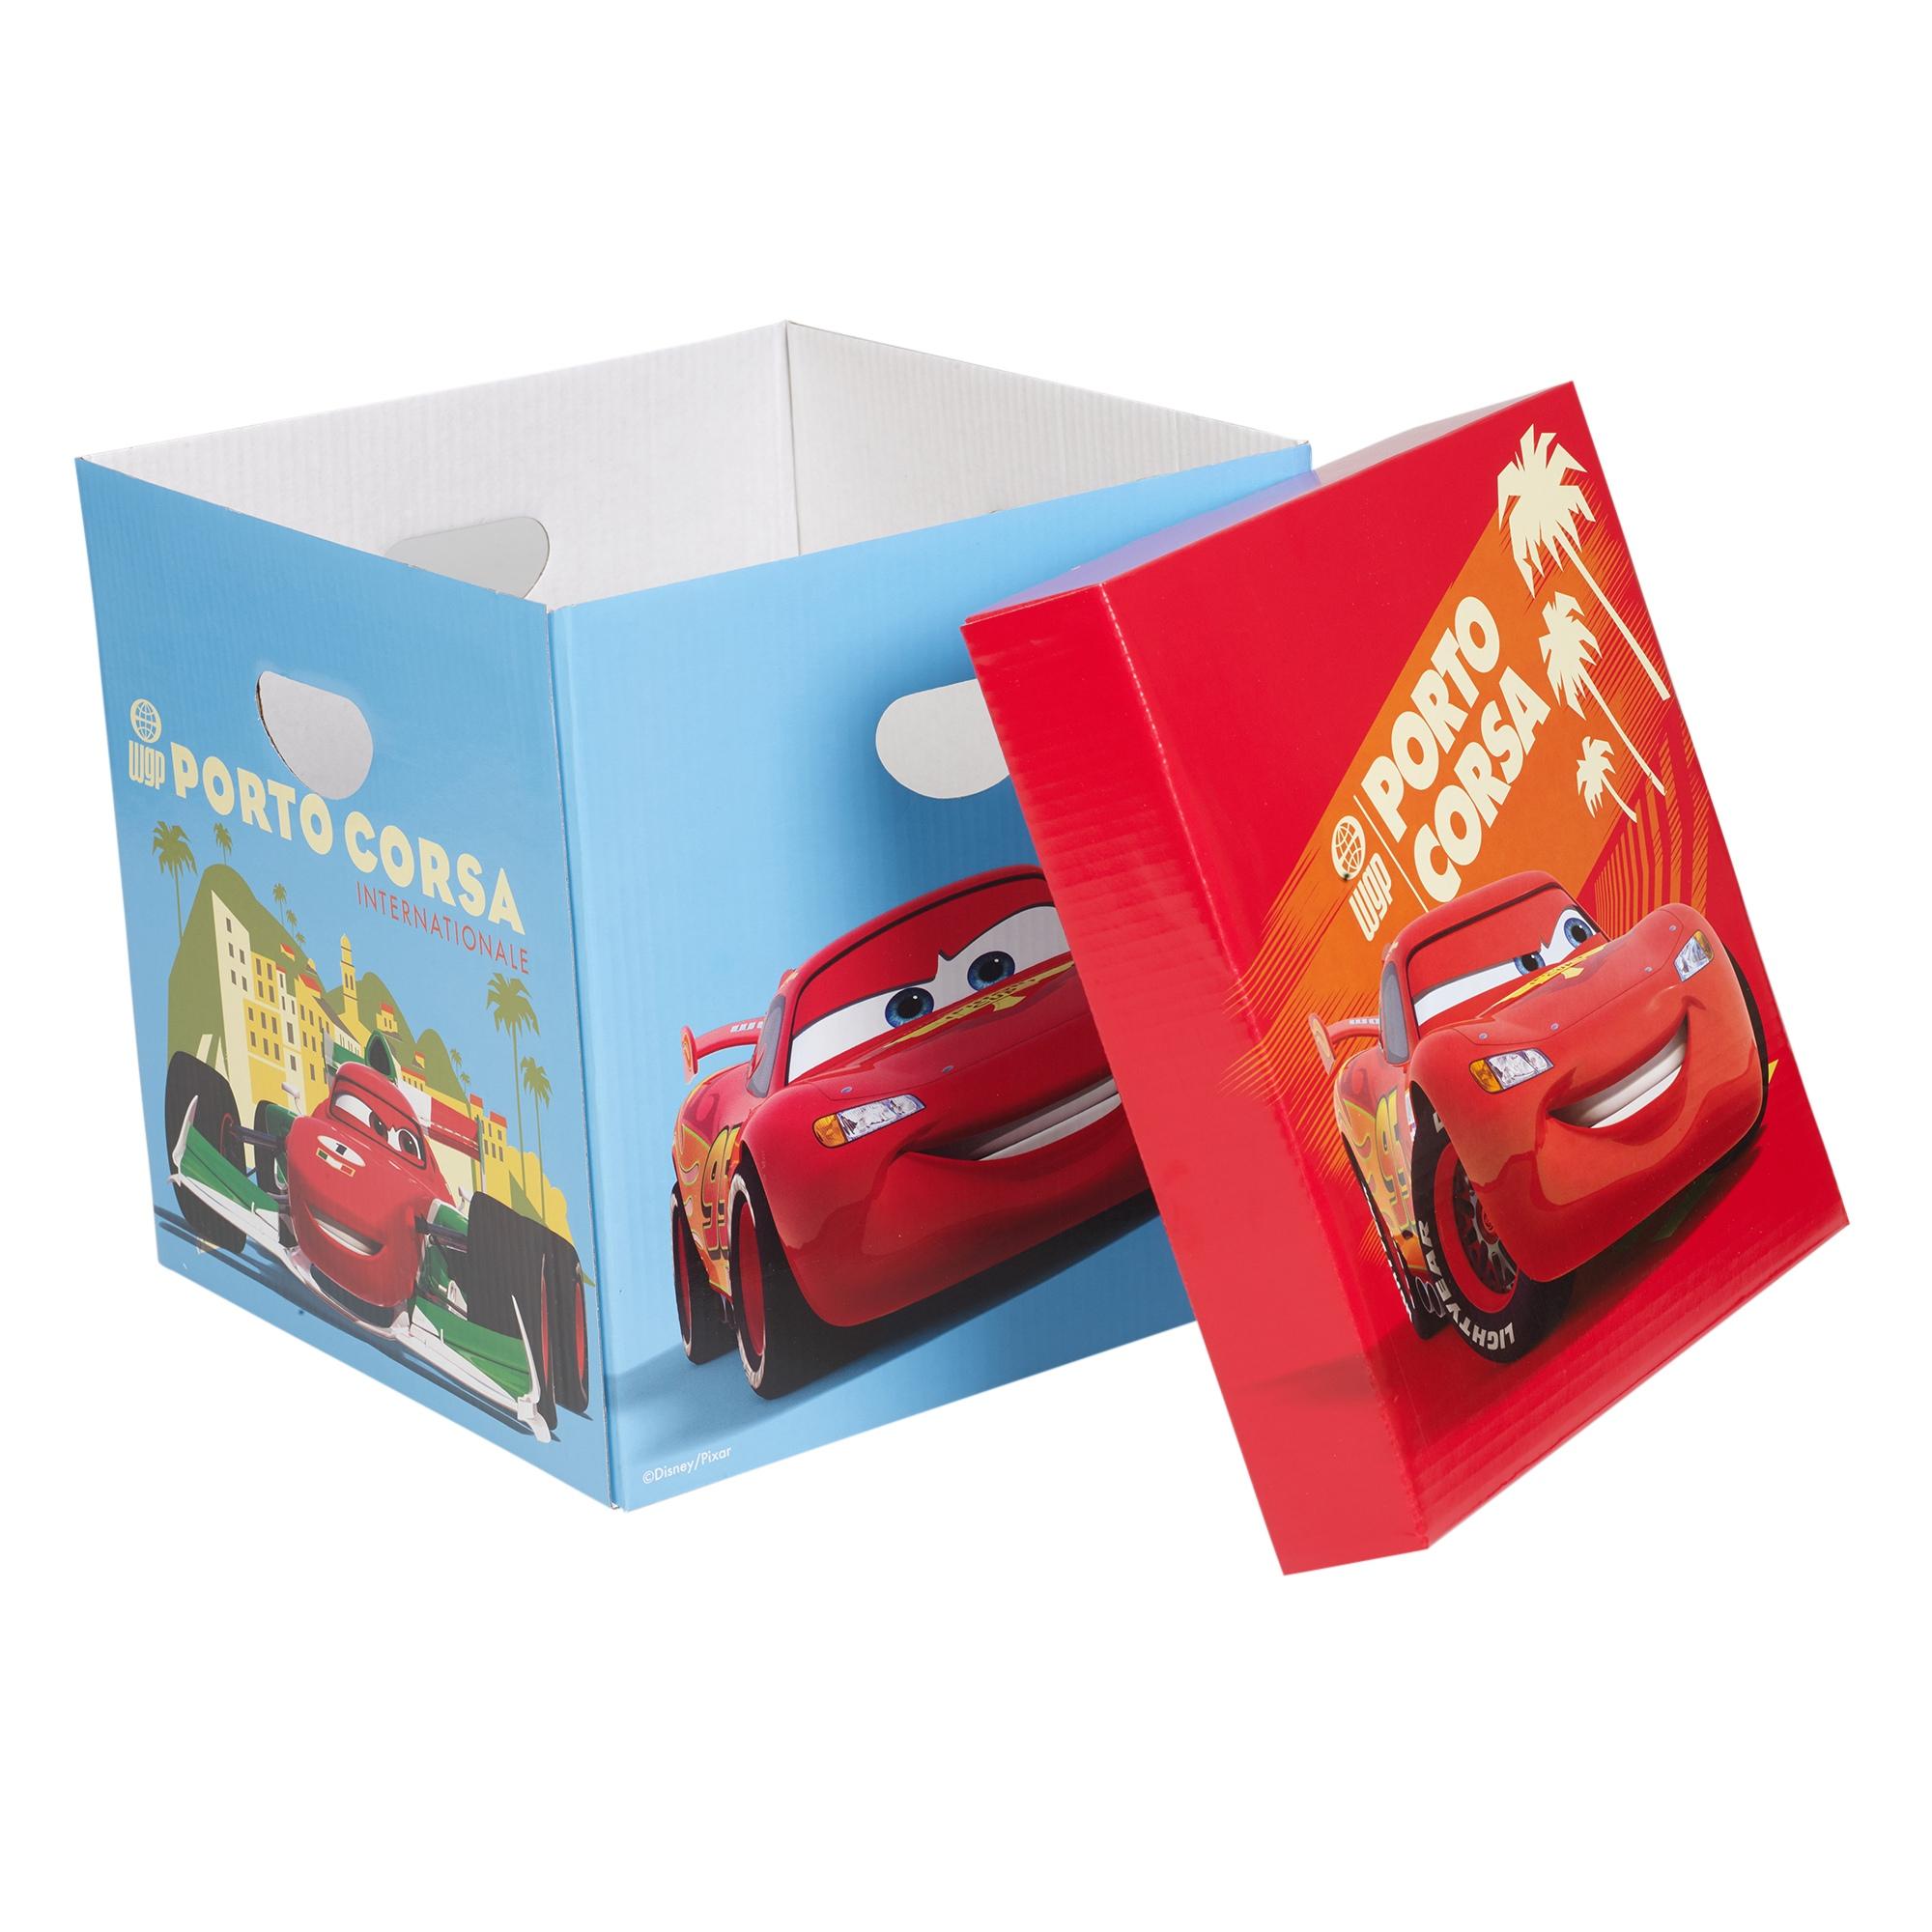 Set of 2 disney cars cardboard storage boxes with lids for Craft storage boxes with lids